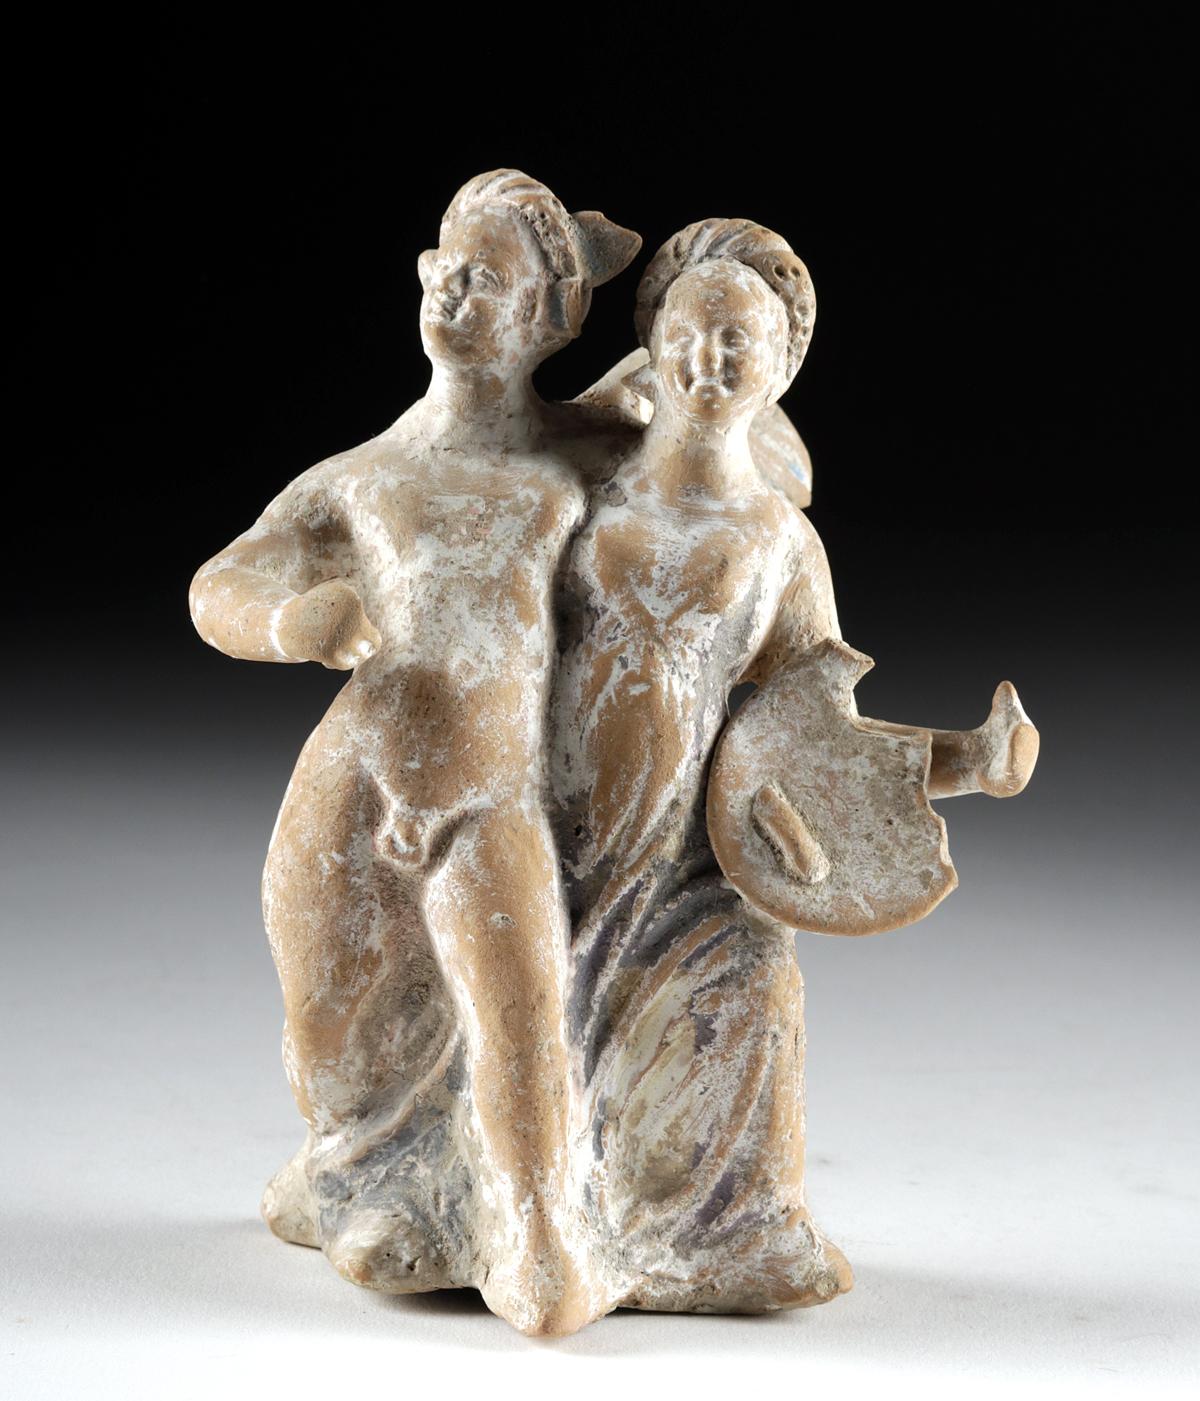 Lot 26a - Canosan Terracotta Eros & Psyche Arm in Arm